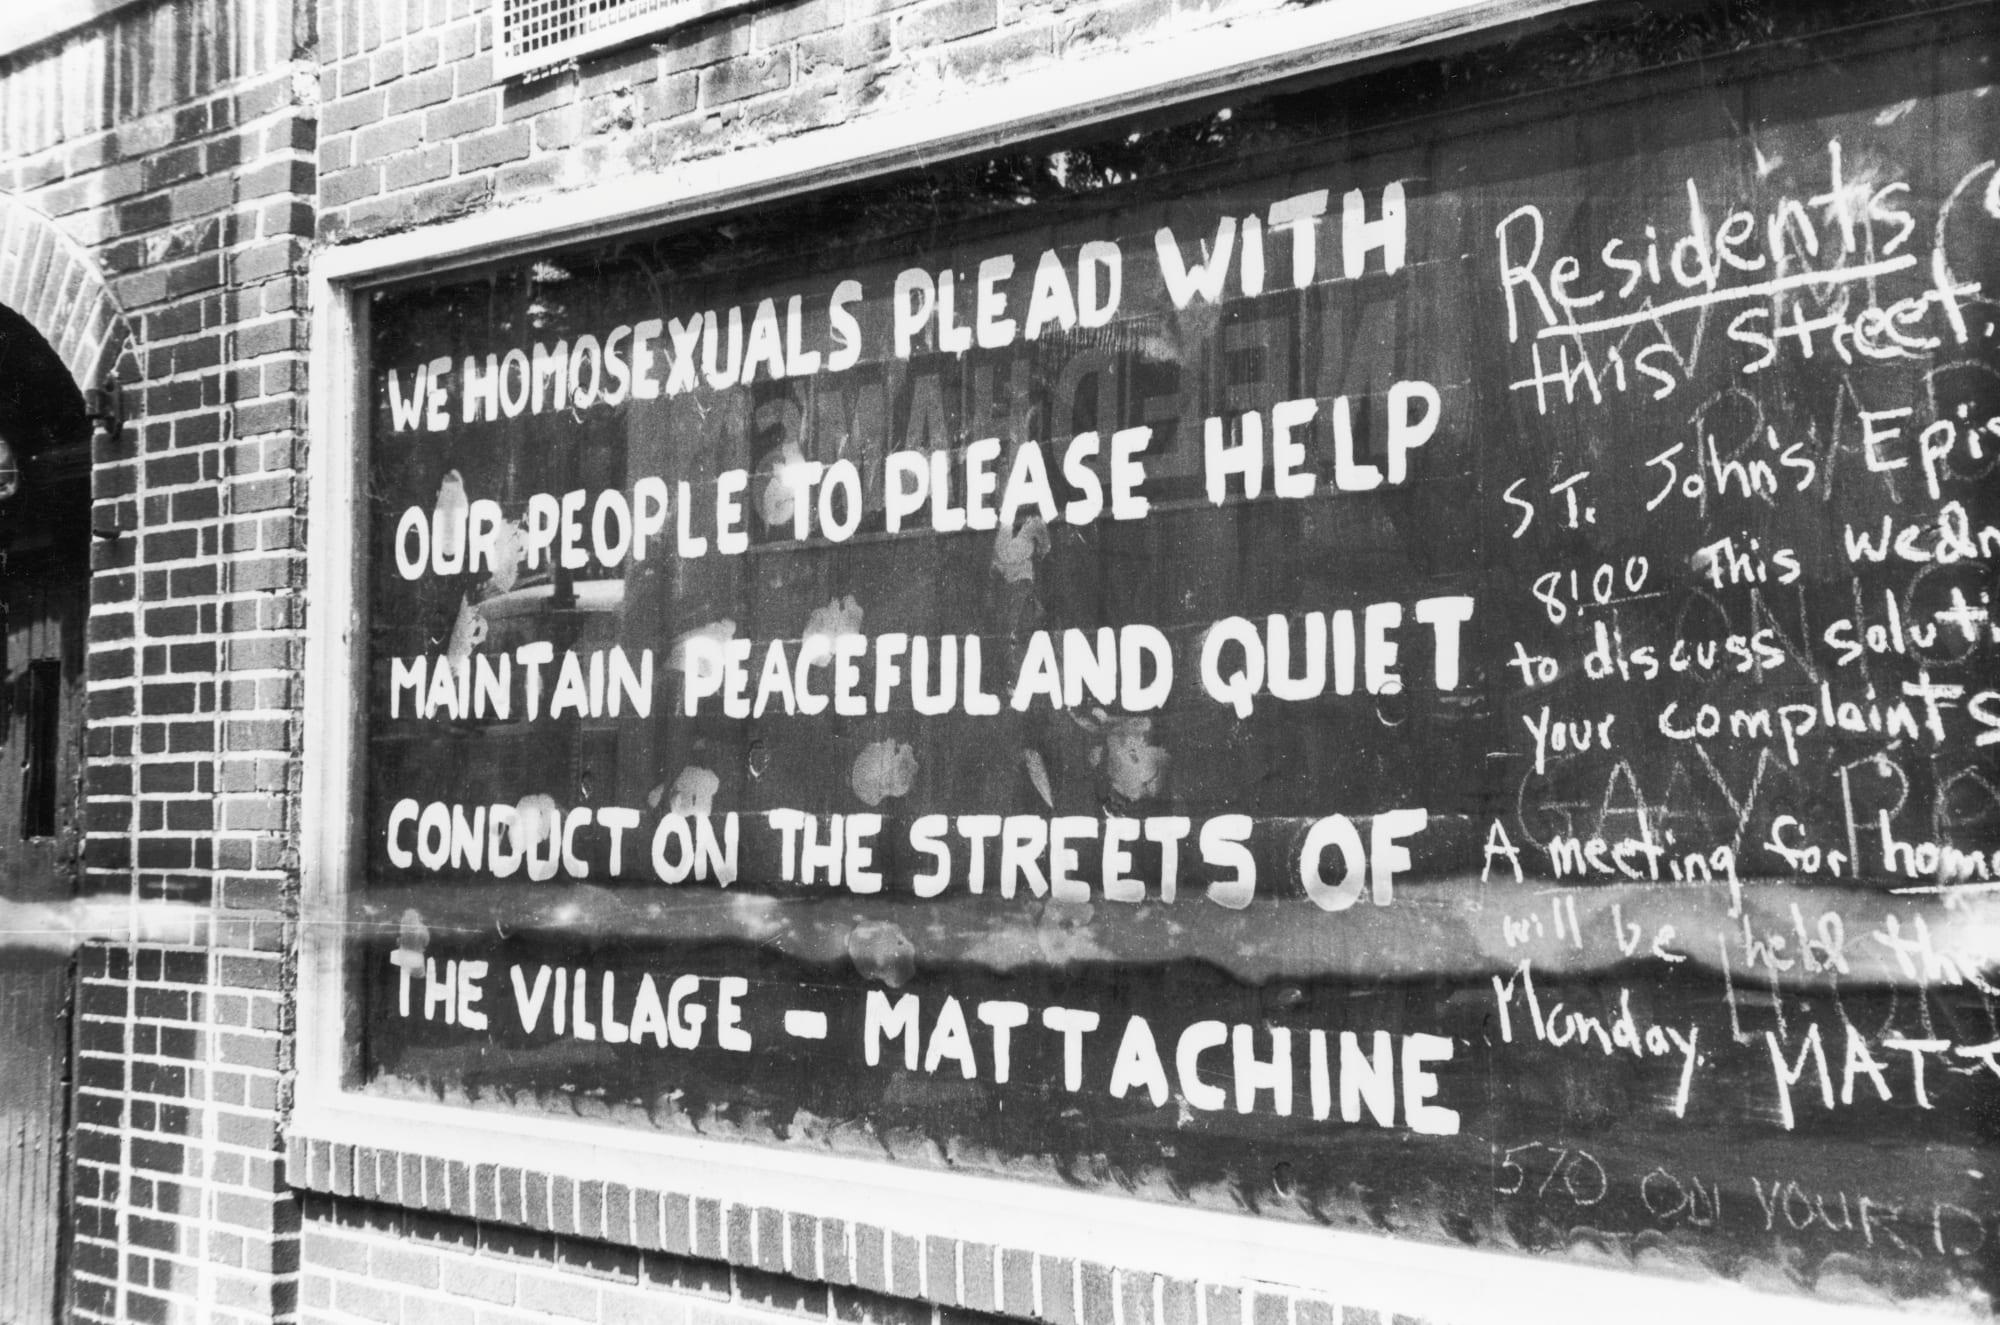 The Mattachine Society